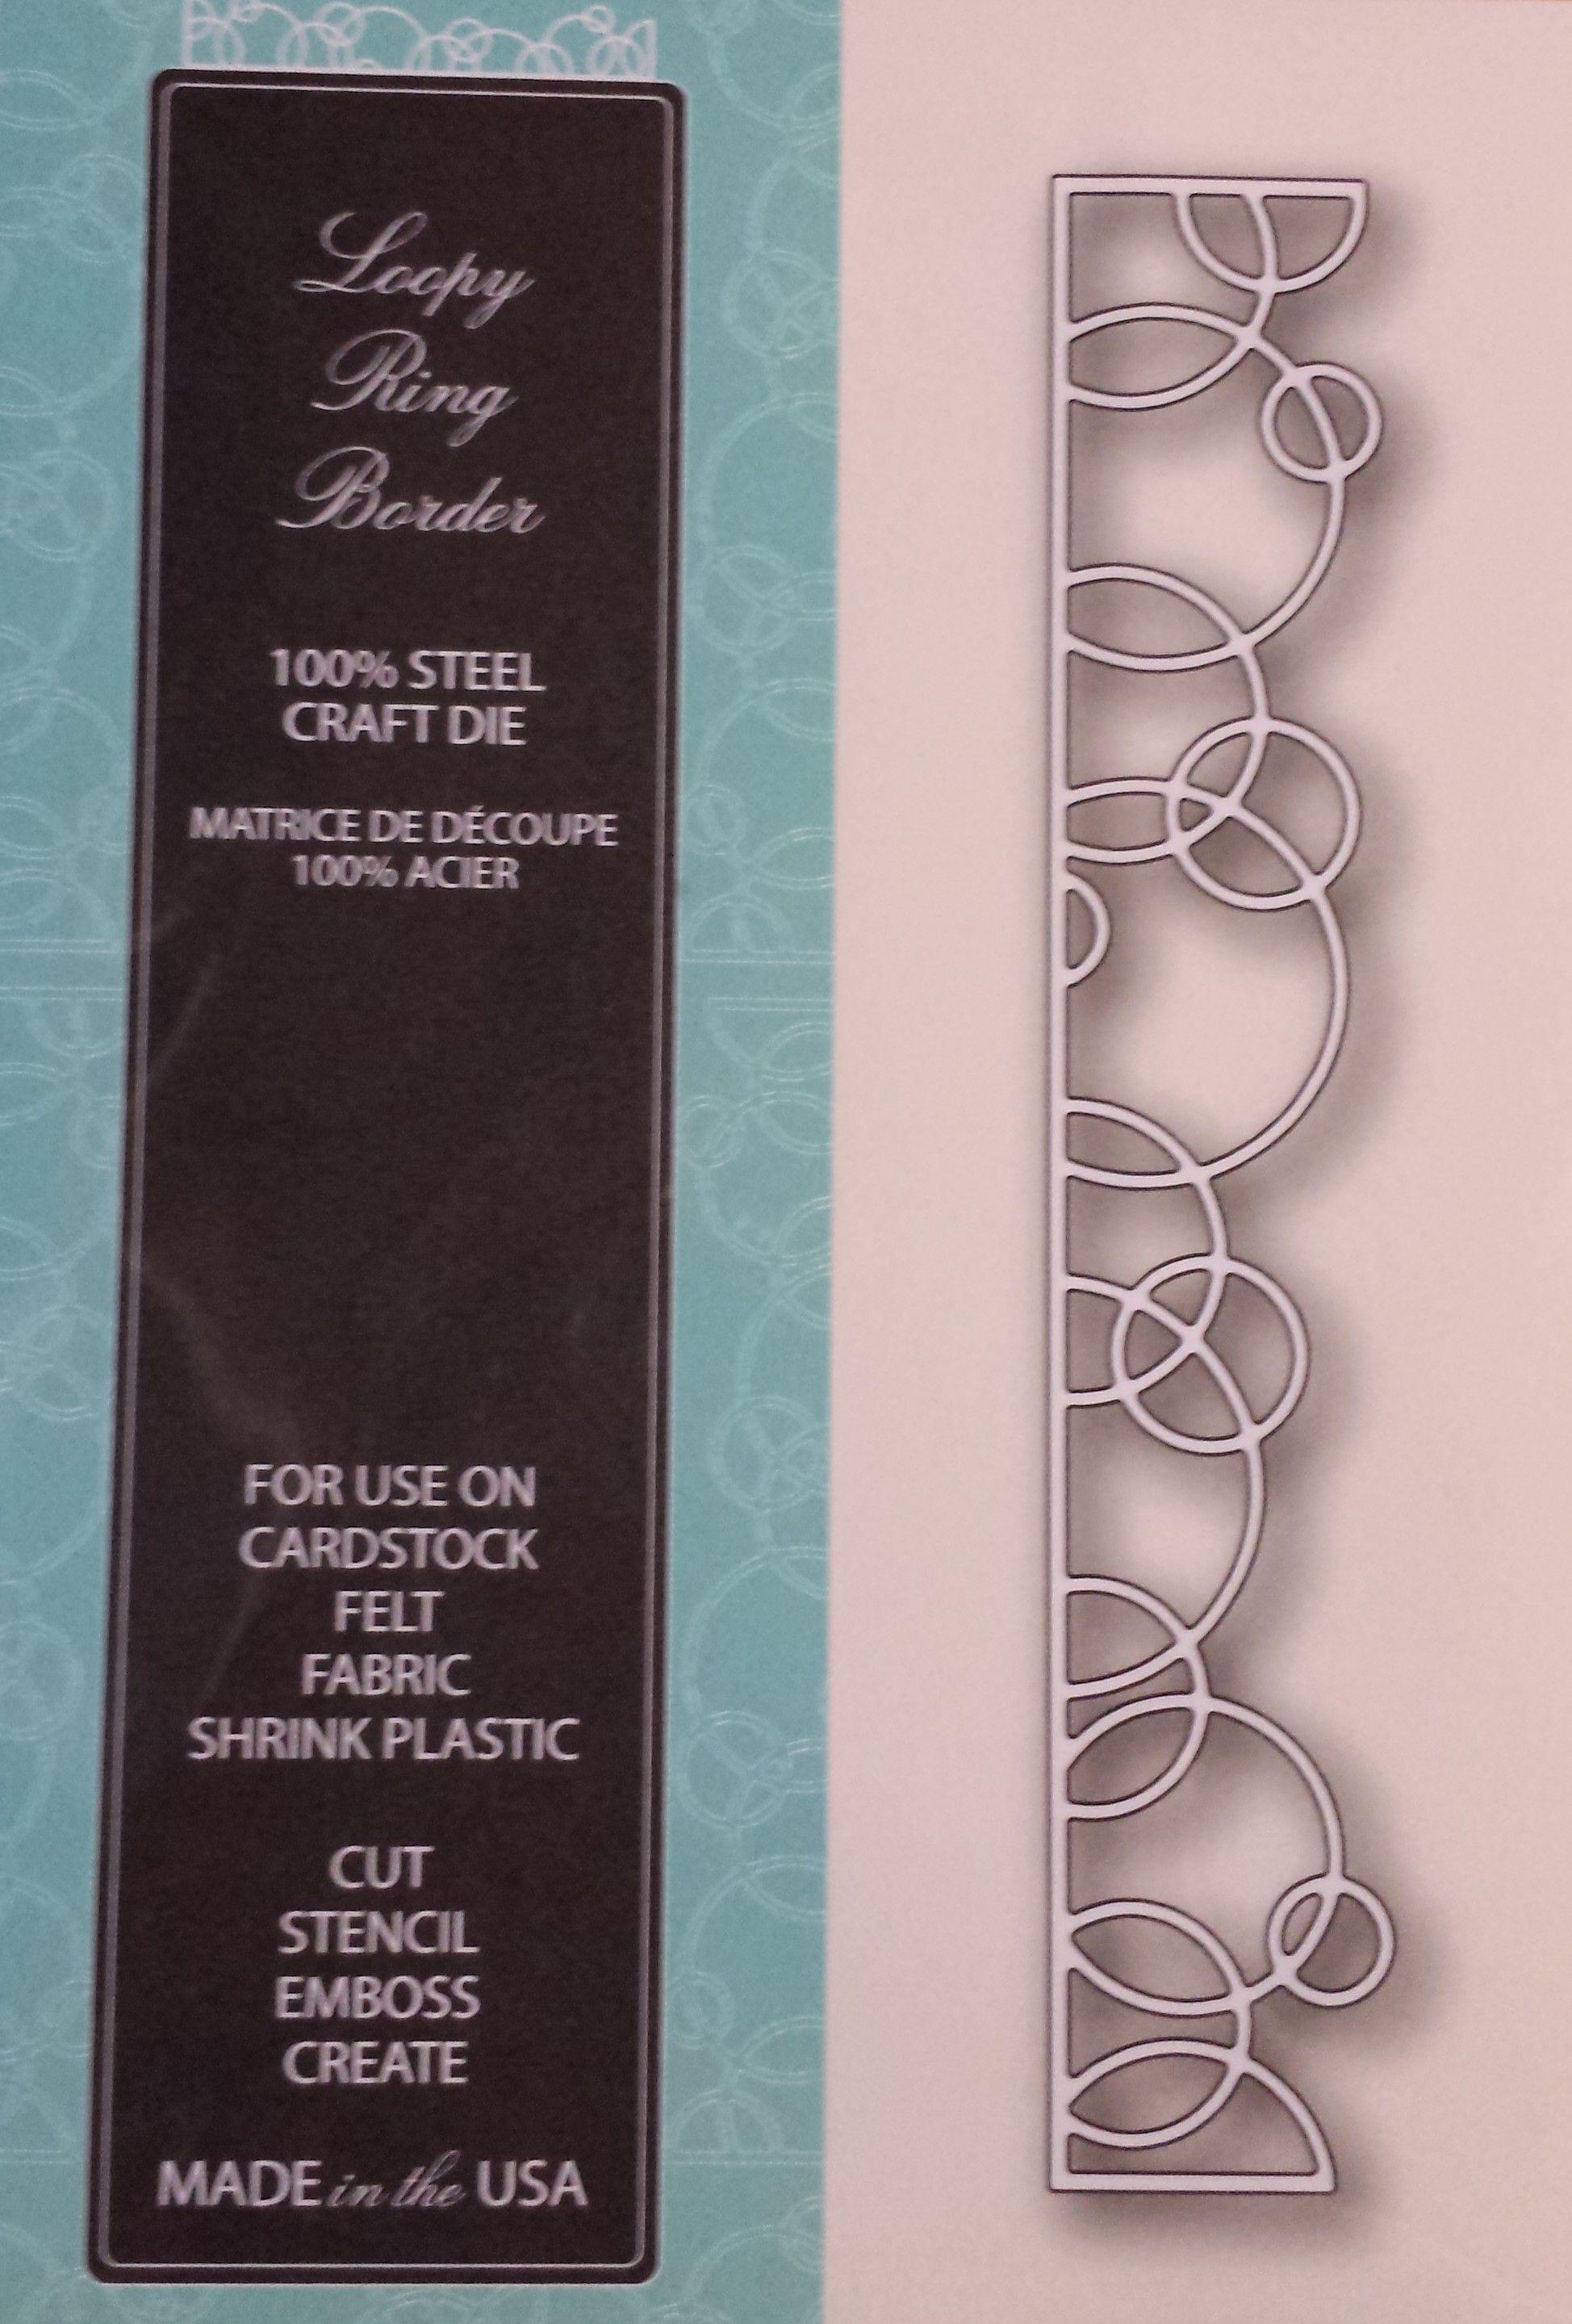 98983 Memory Box 100% Steel Craft Die Loopy Ring Border | Трафареты ...